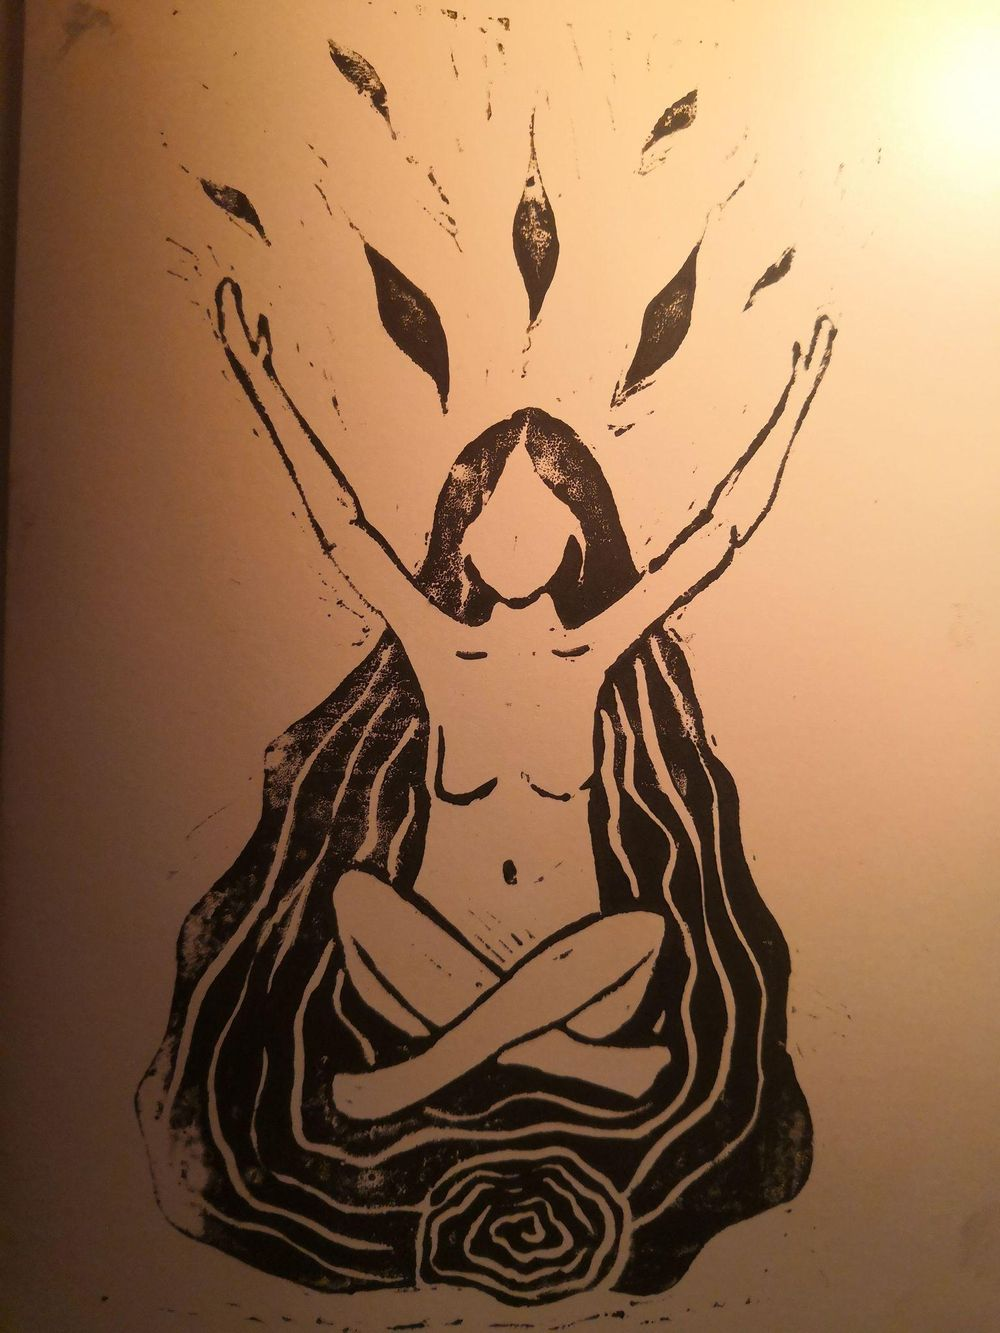 Univ.earth goddess - image 1 - student project